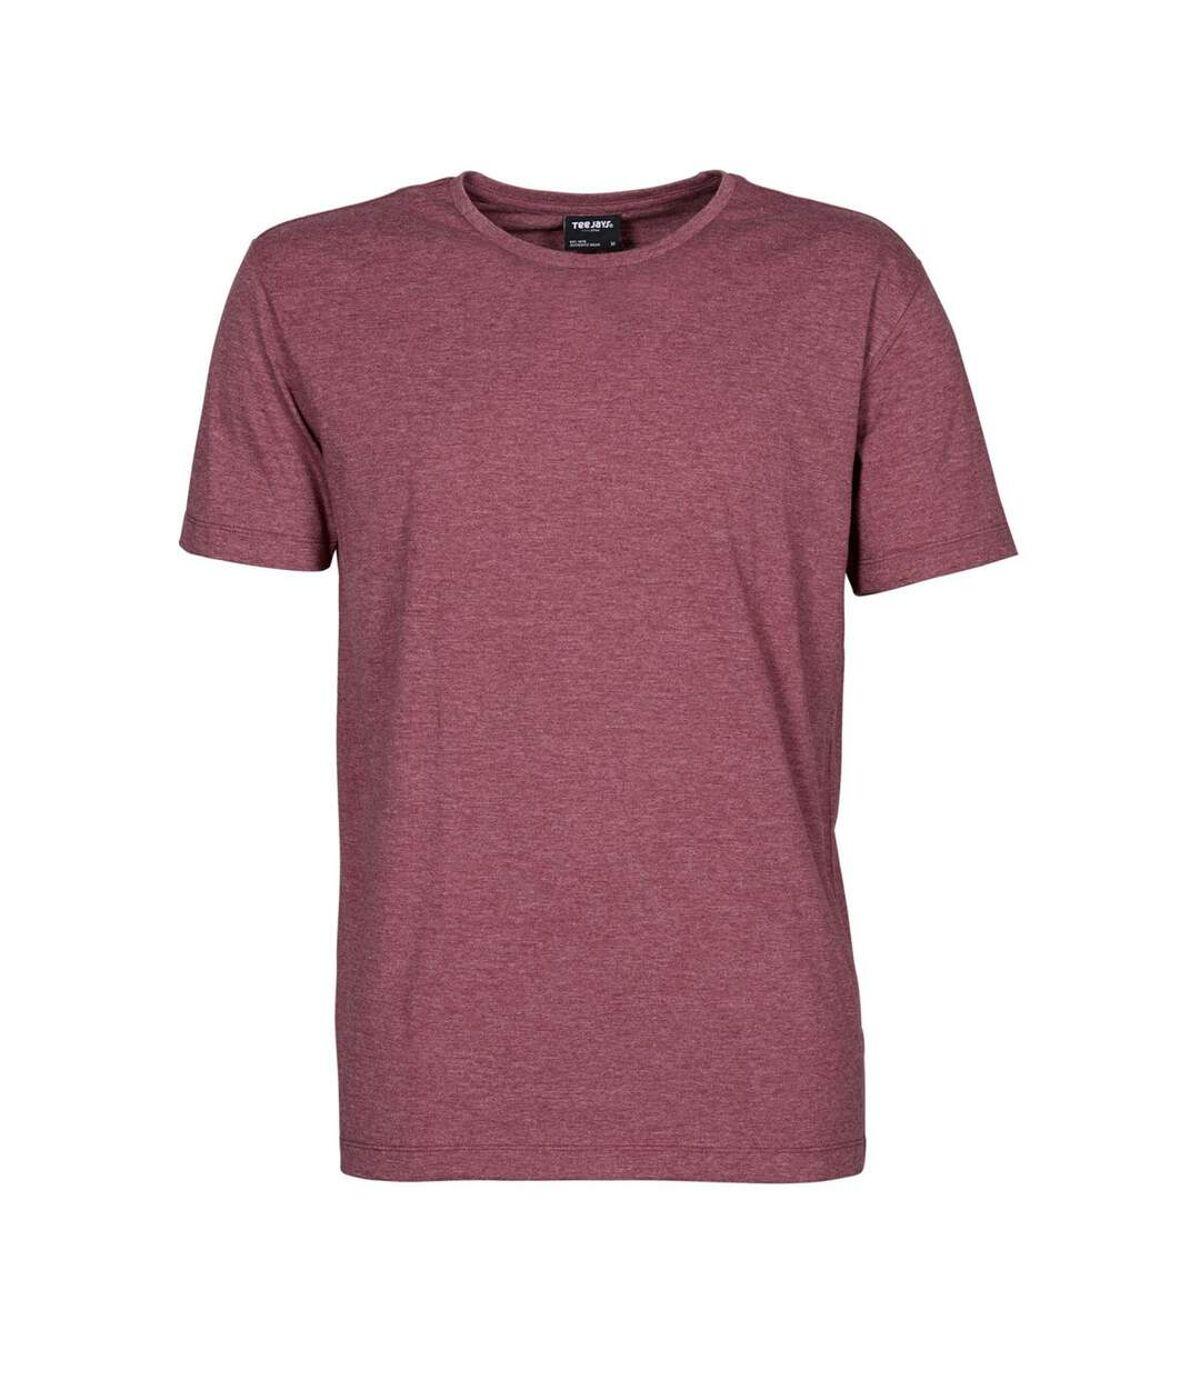 Tee Jays Mens Urban Short Sleeve Melange T-Shirt (Wine Melange) - UTBC3816